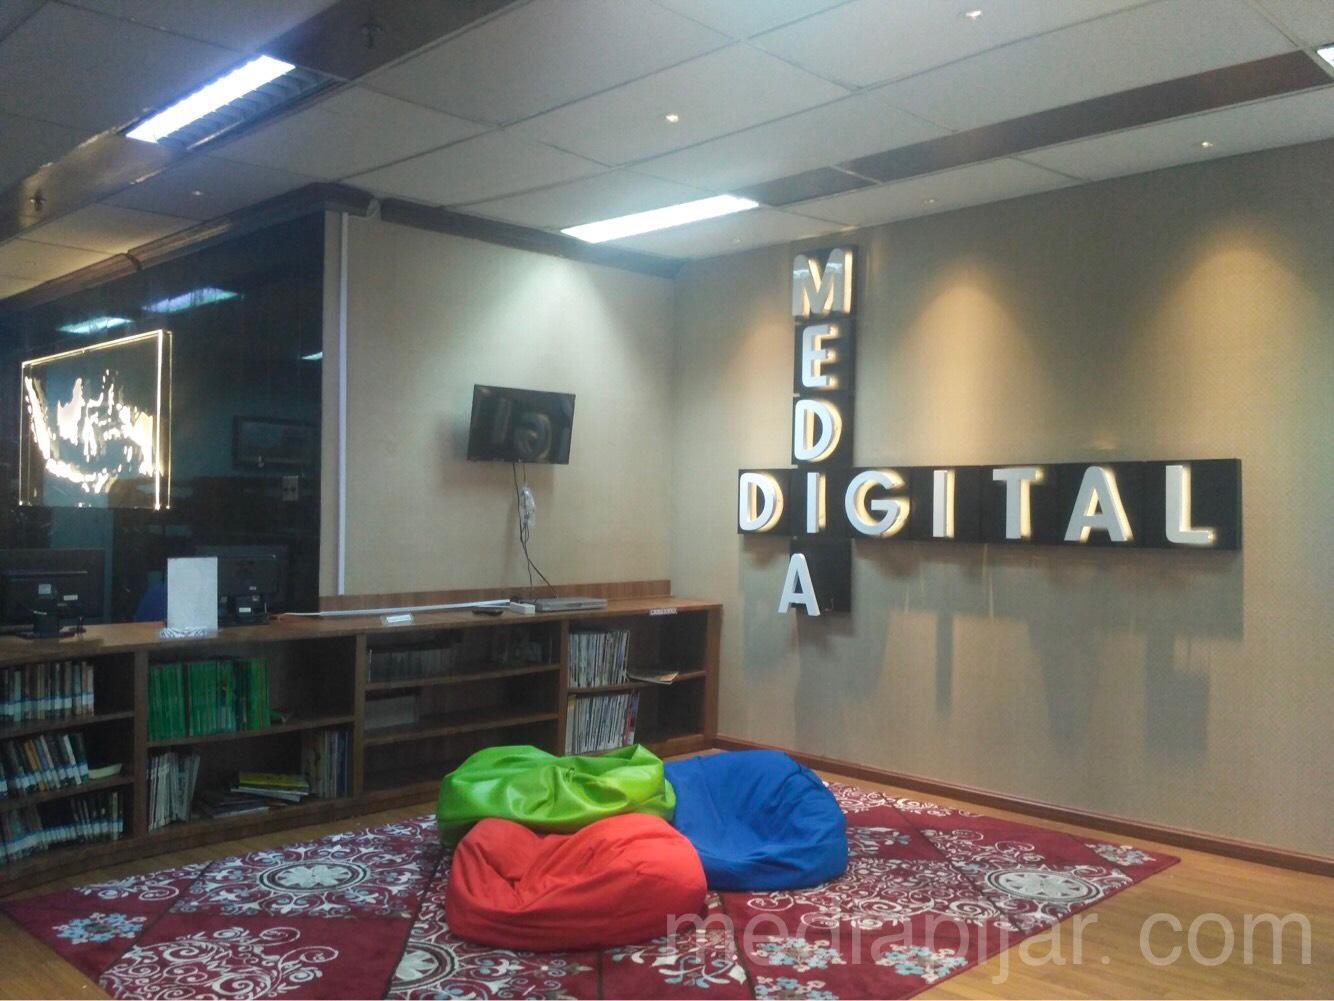 Suasana di perpustakaan Bank Indonsia Fotografer: Dasmida